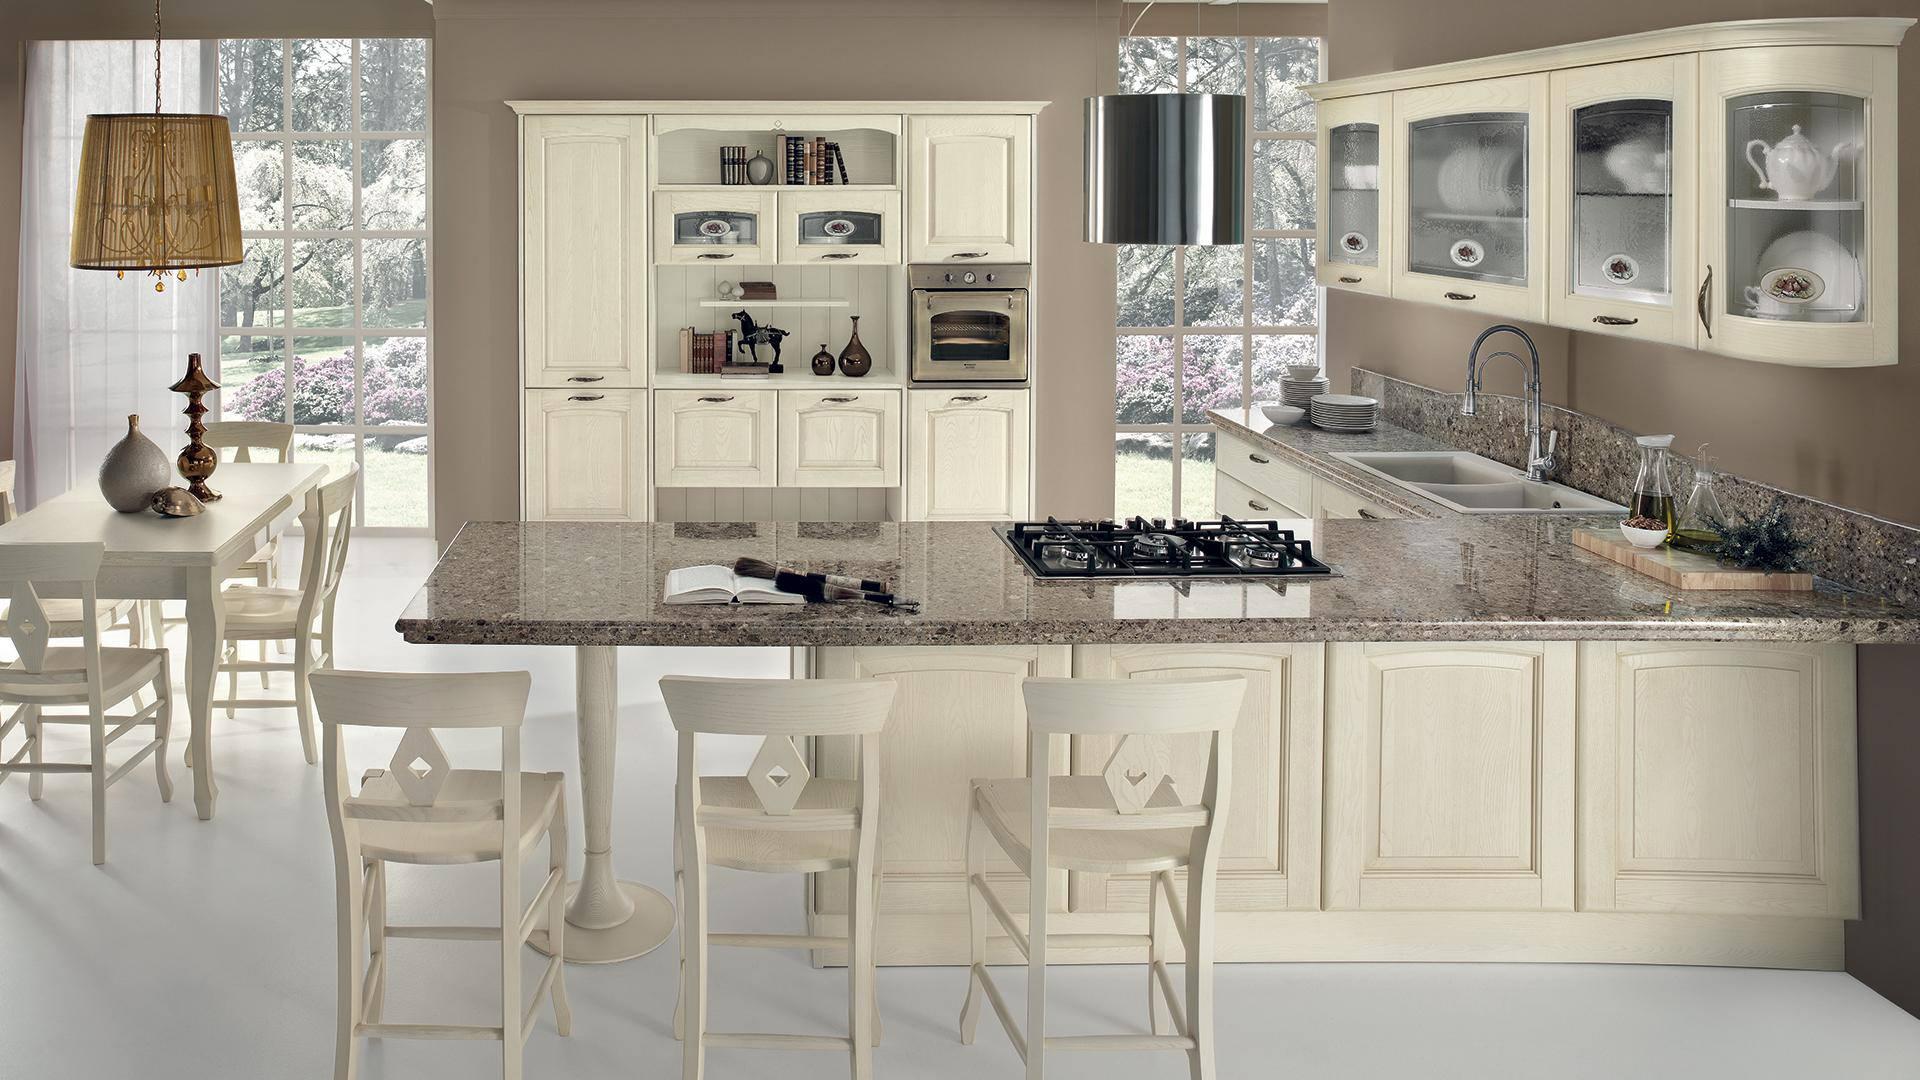 Emejing cucine stile classico moderno photos - Cucine in muratura stile moderno ...